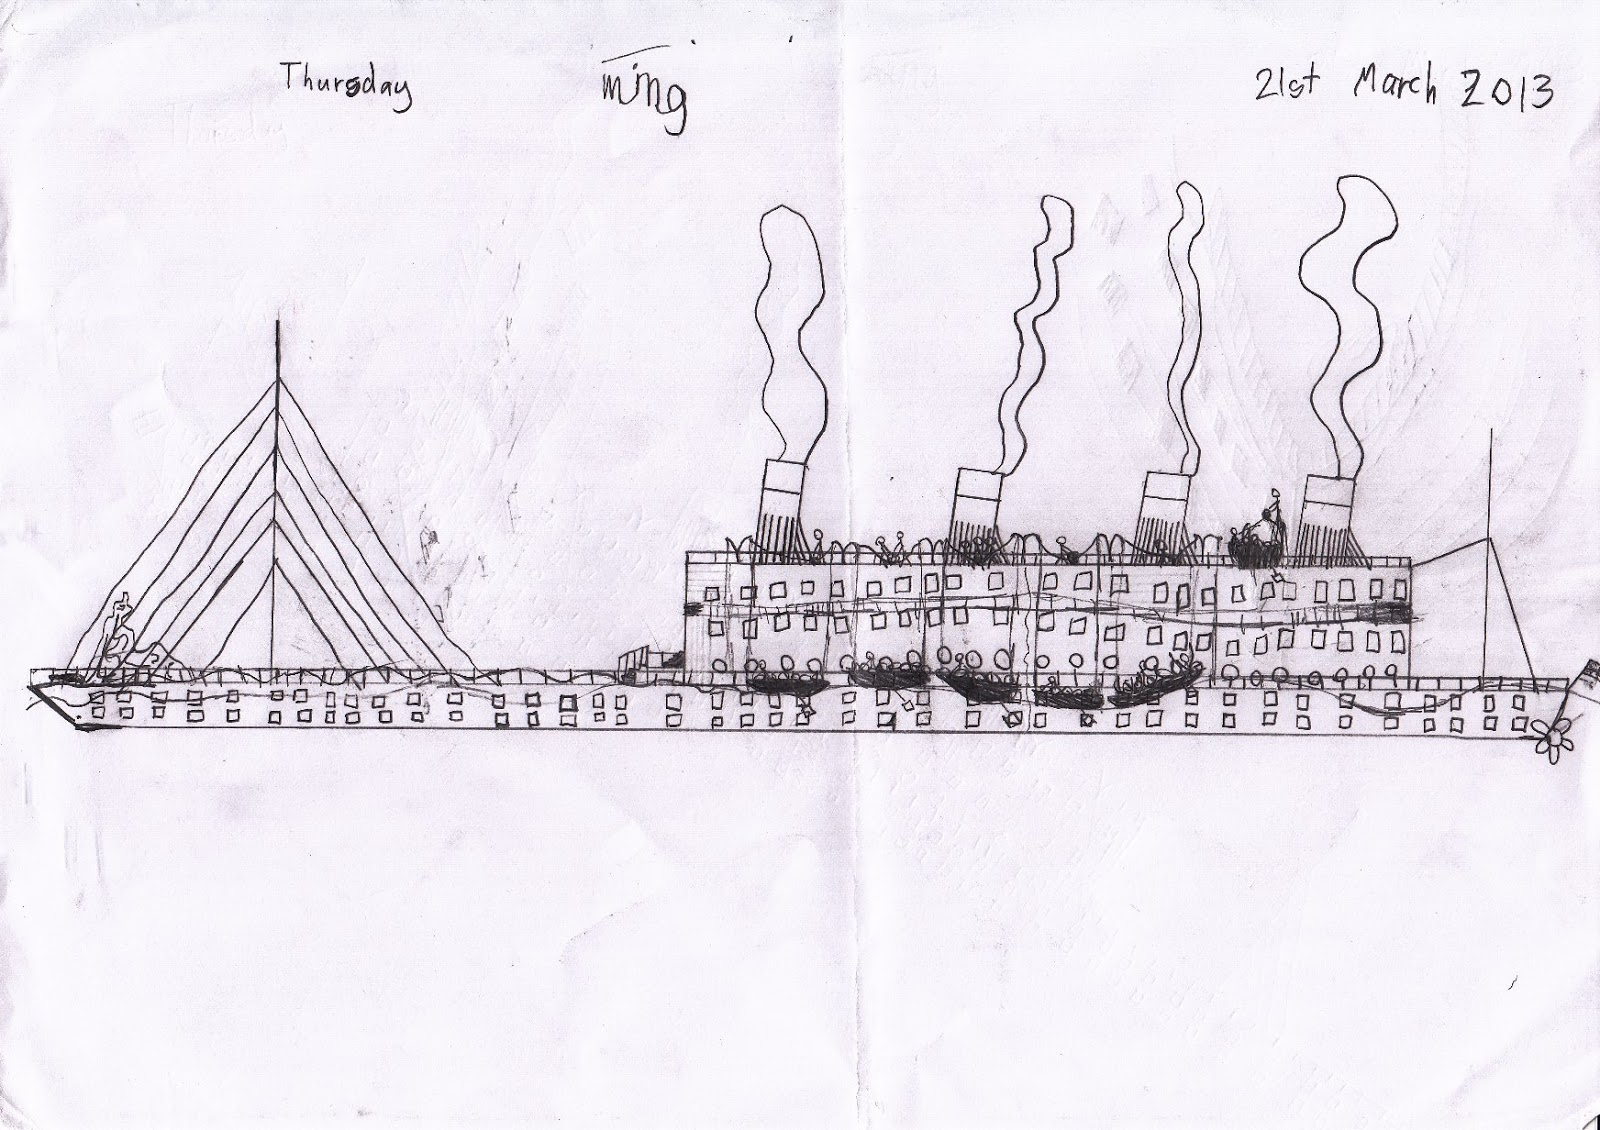 medium resolution of rms titanic 15 apr 2013